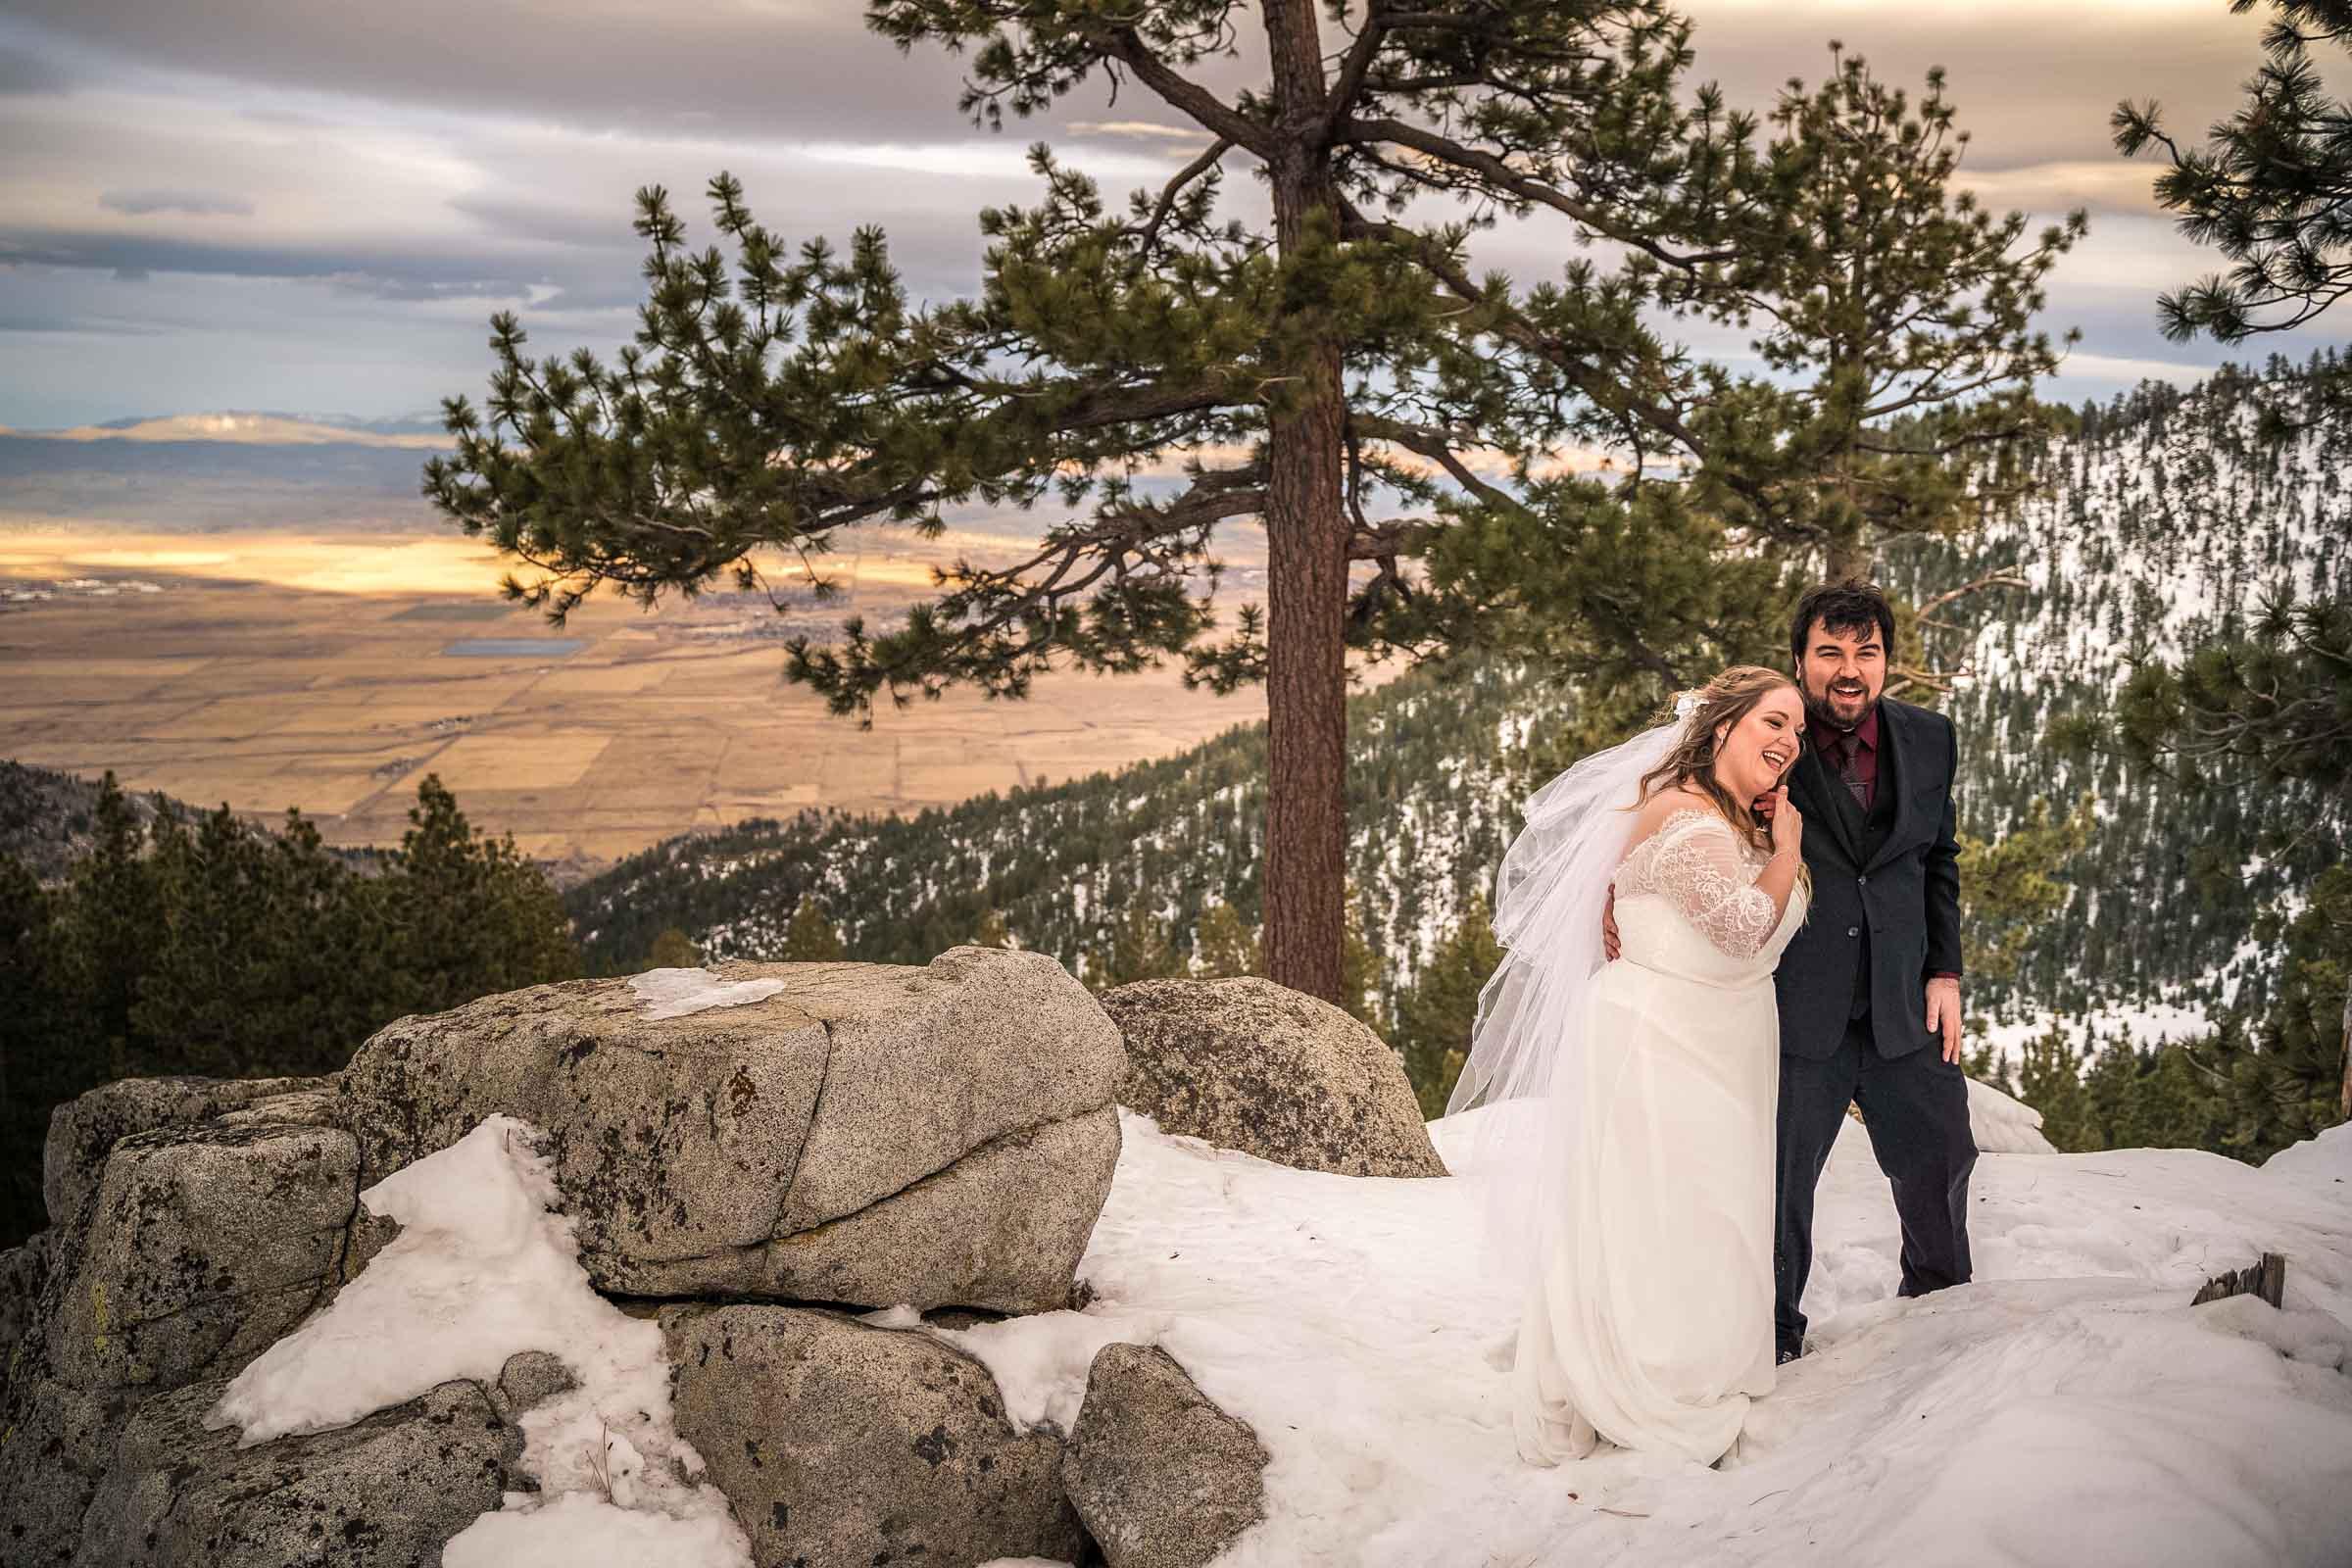 Wedding photos at The Ridge Resort in Kingsbury, Nevada